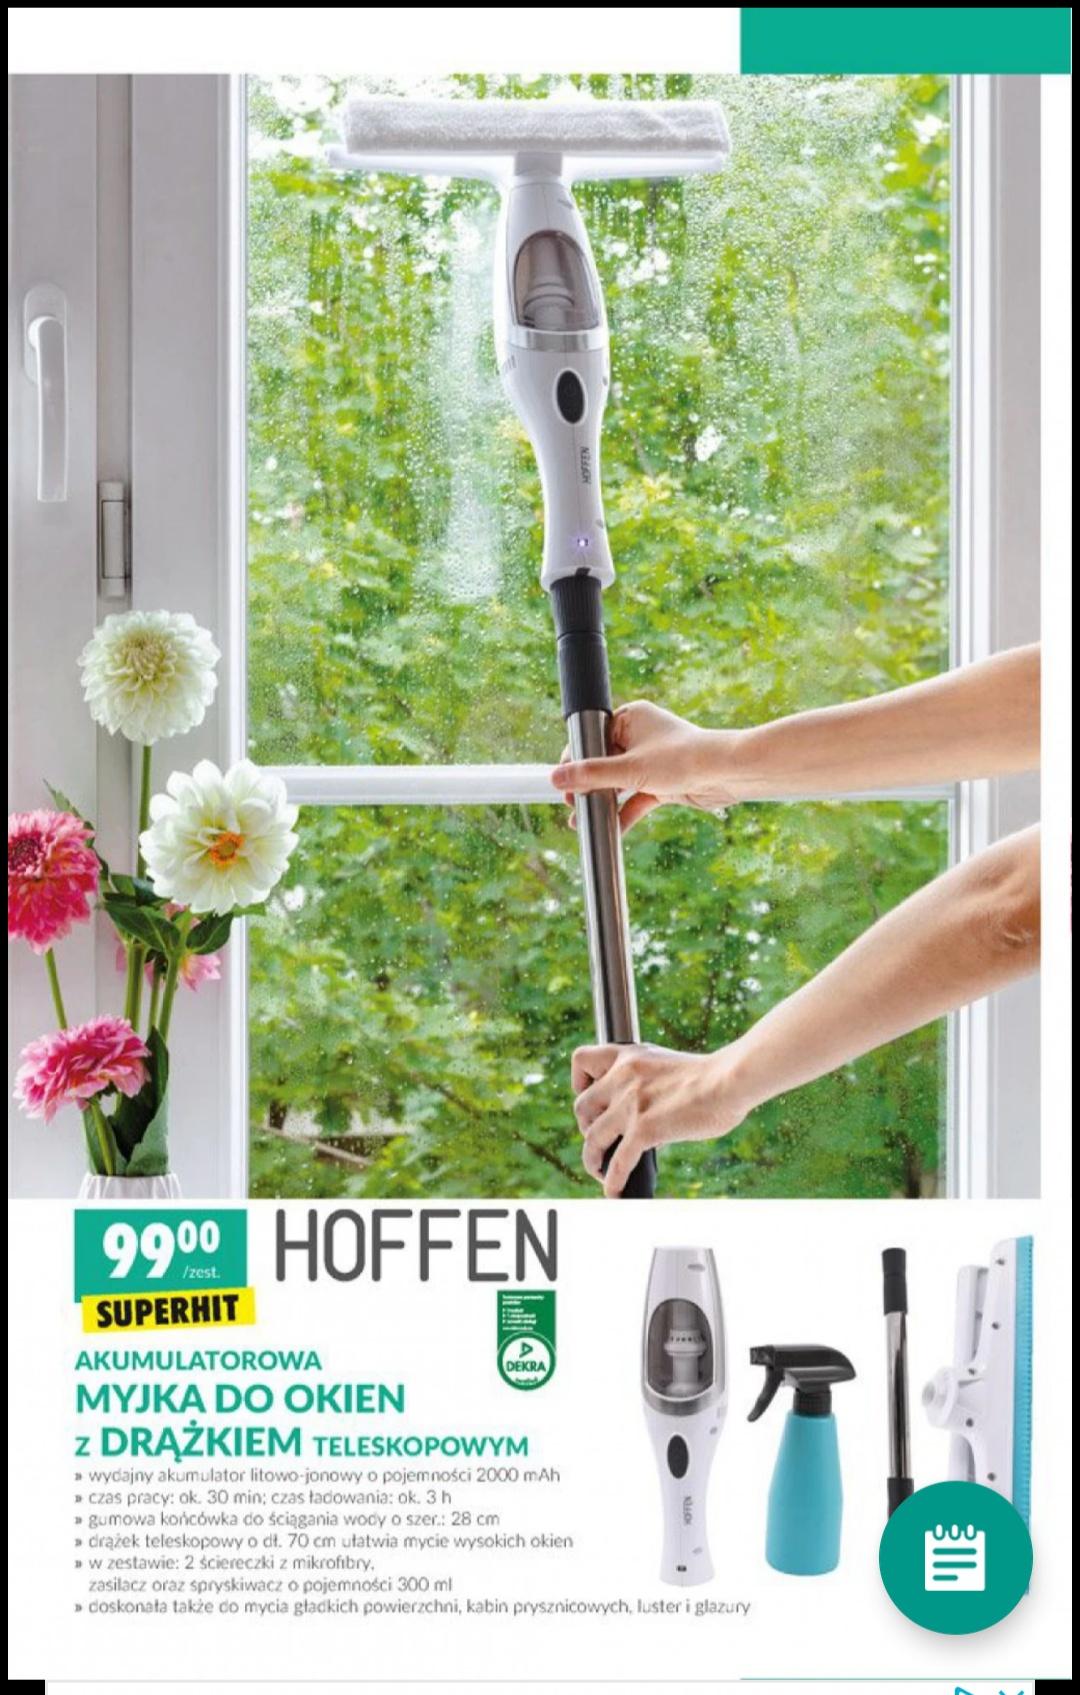 Biedronka promocja na myjkę Hoffen